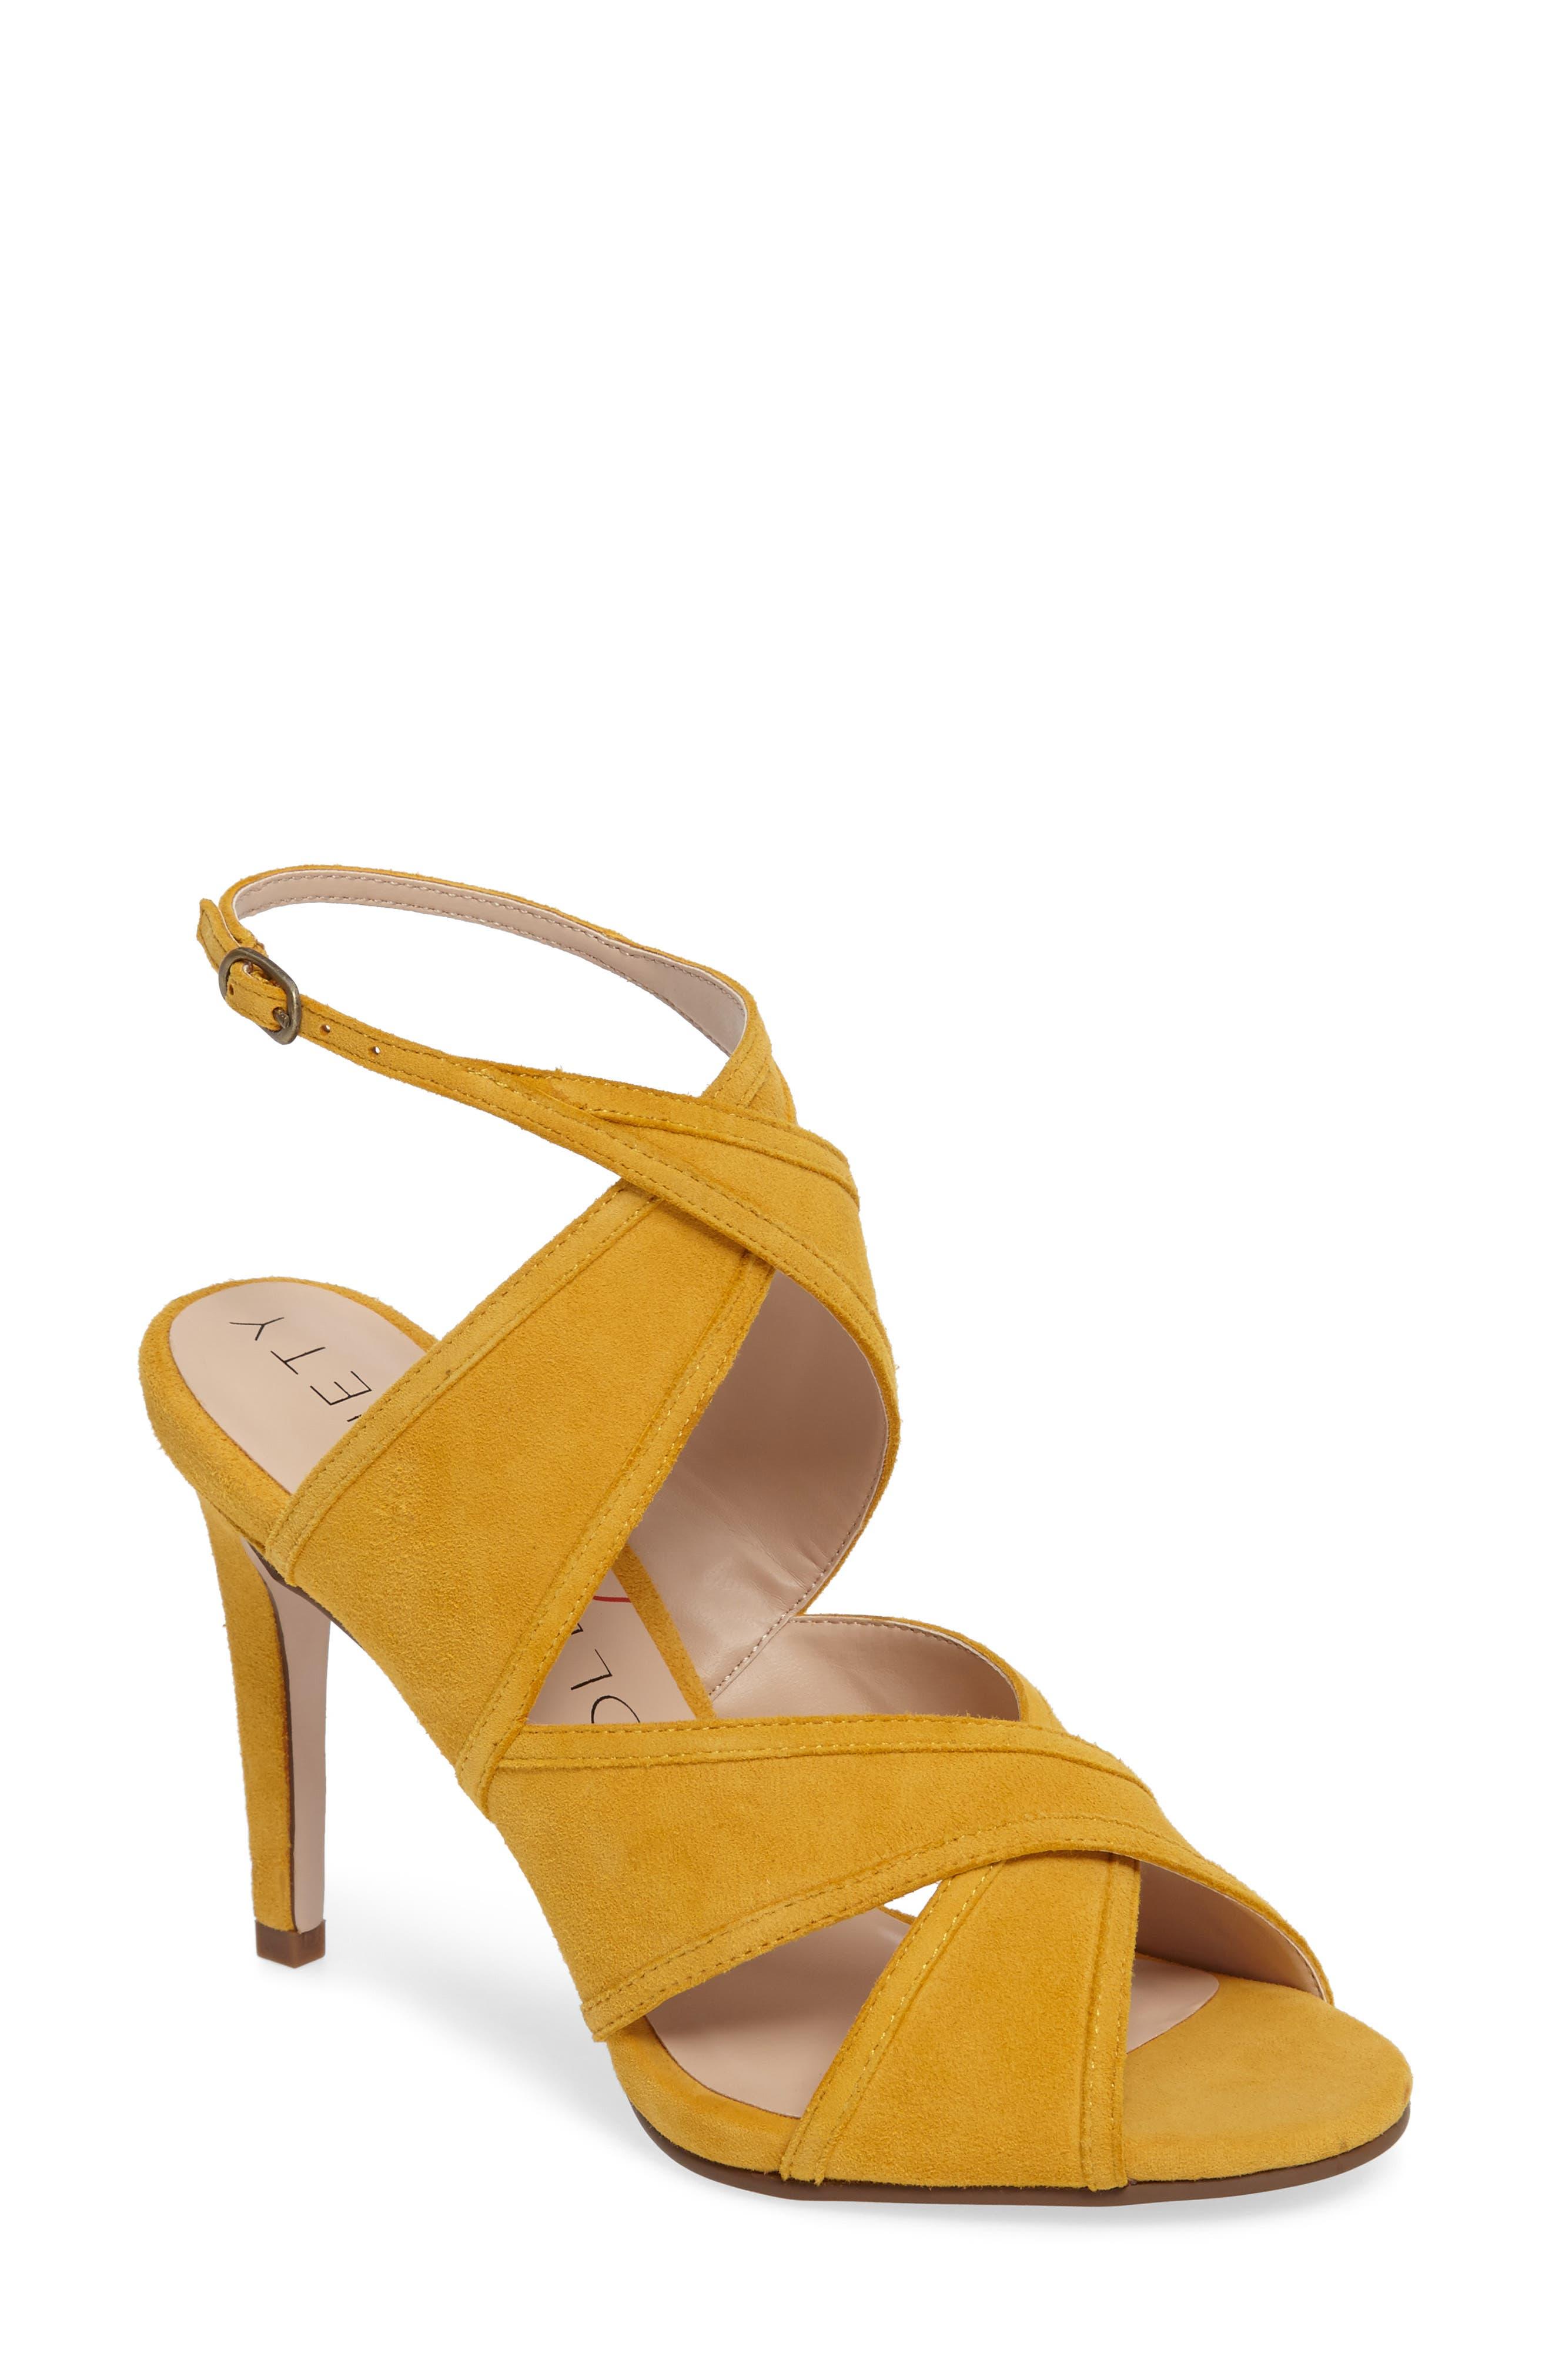 Esme Cross Strap Sandal,                             Main thumbnail 2, color,